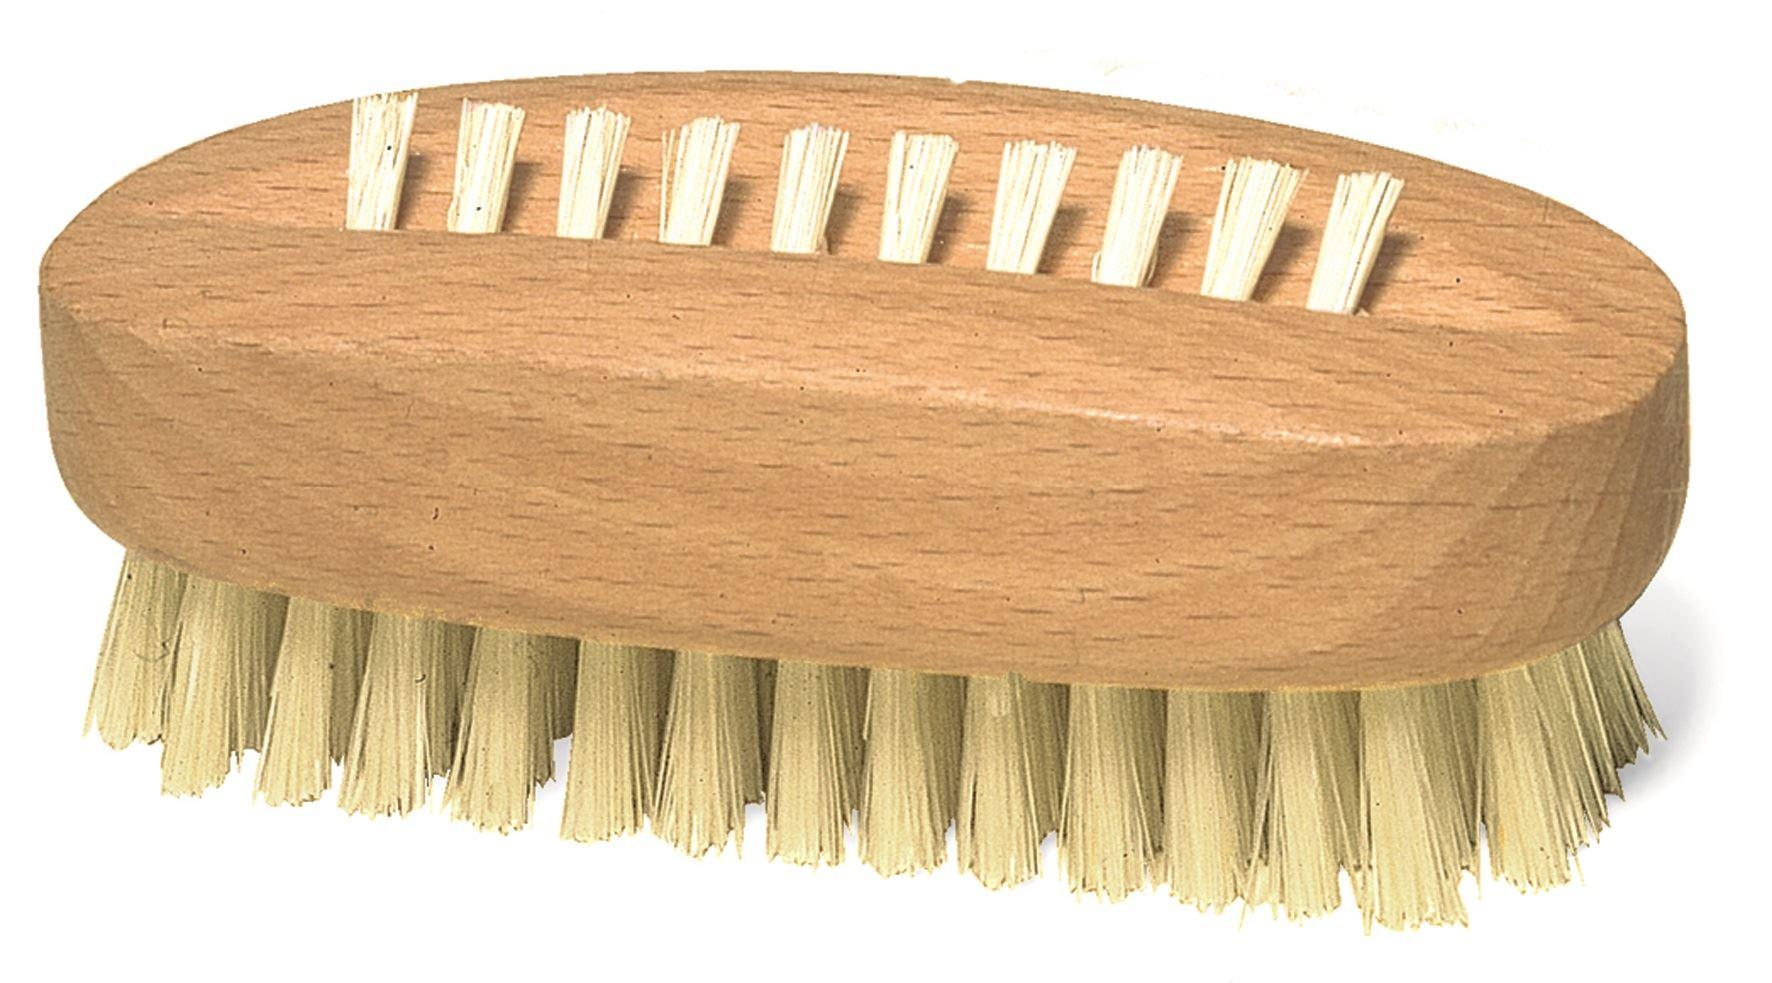 Redecker Behandelt Holz Badezimmer Beauty Nagel Putz Bursten Ebay